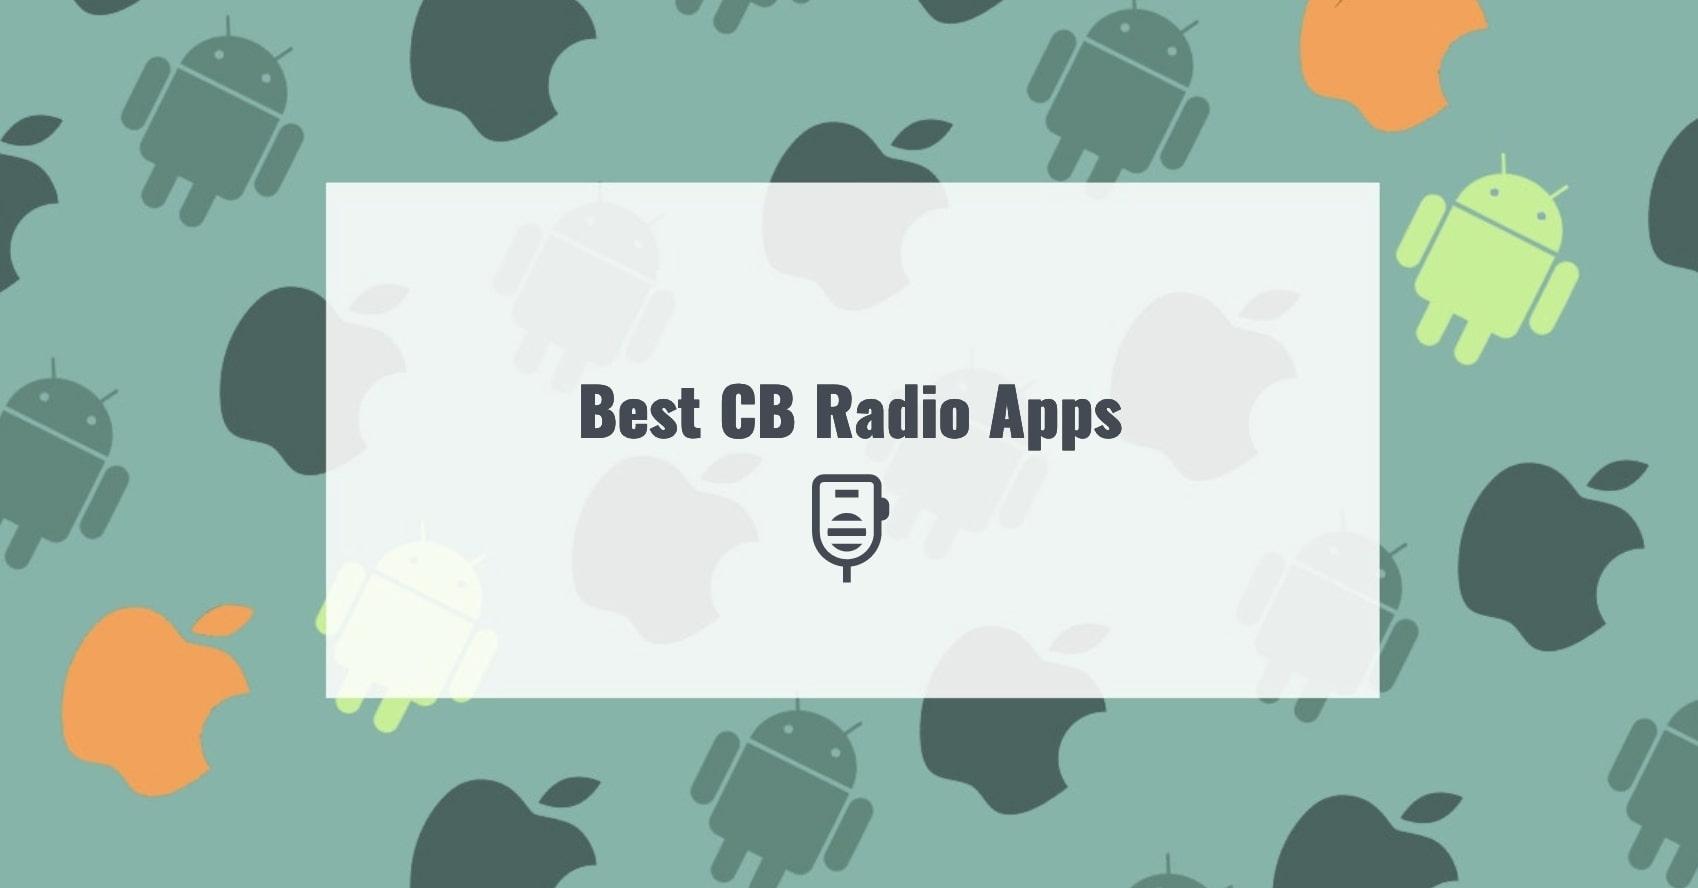 Best CB Radio Apps